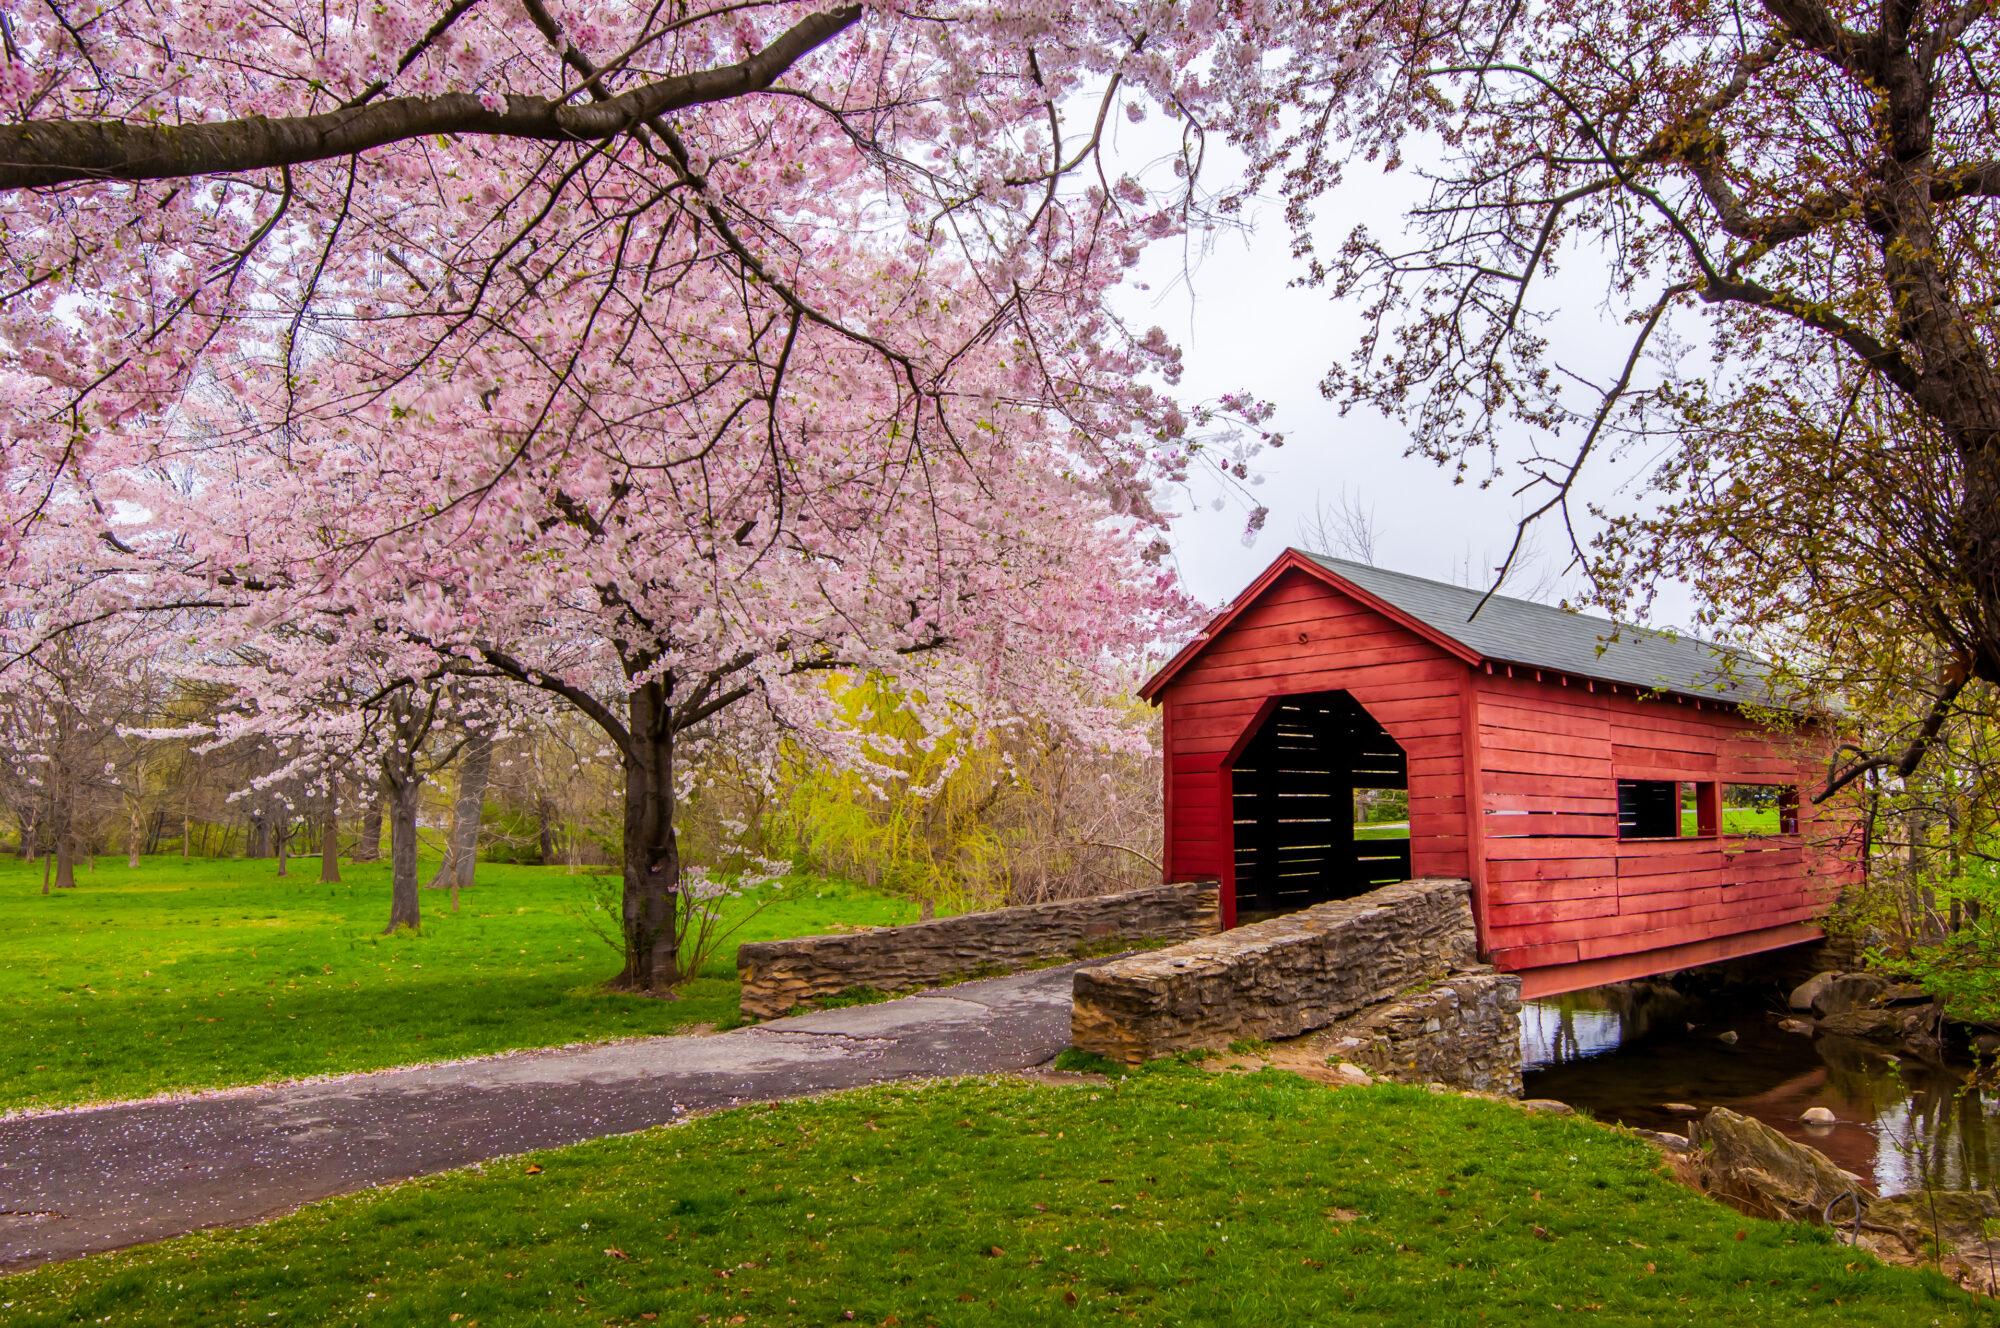 Carroll Creek Covered Bridge, Frederick, Maryland.